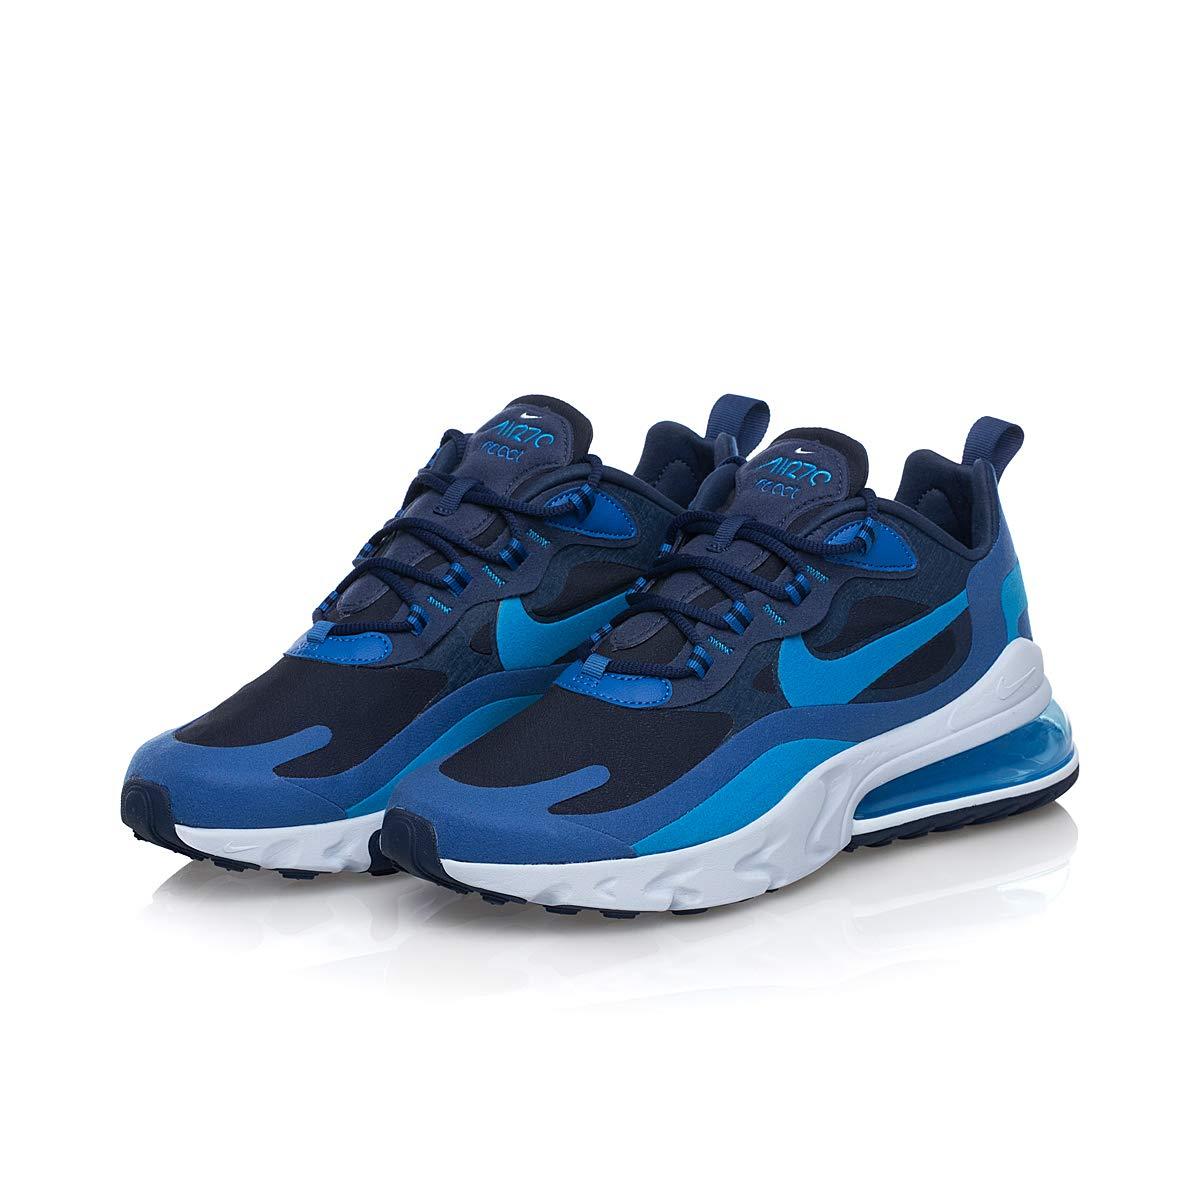 Nike Air Max 270 React: Amazon.it: Scarpe e borse